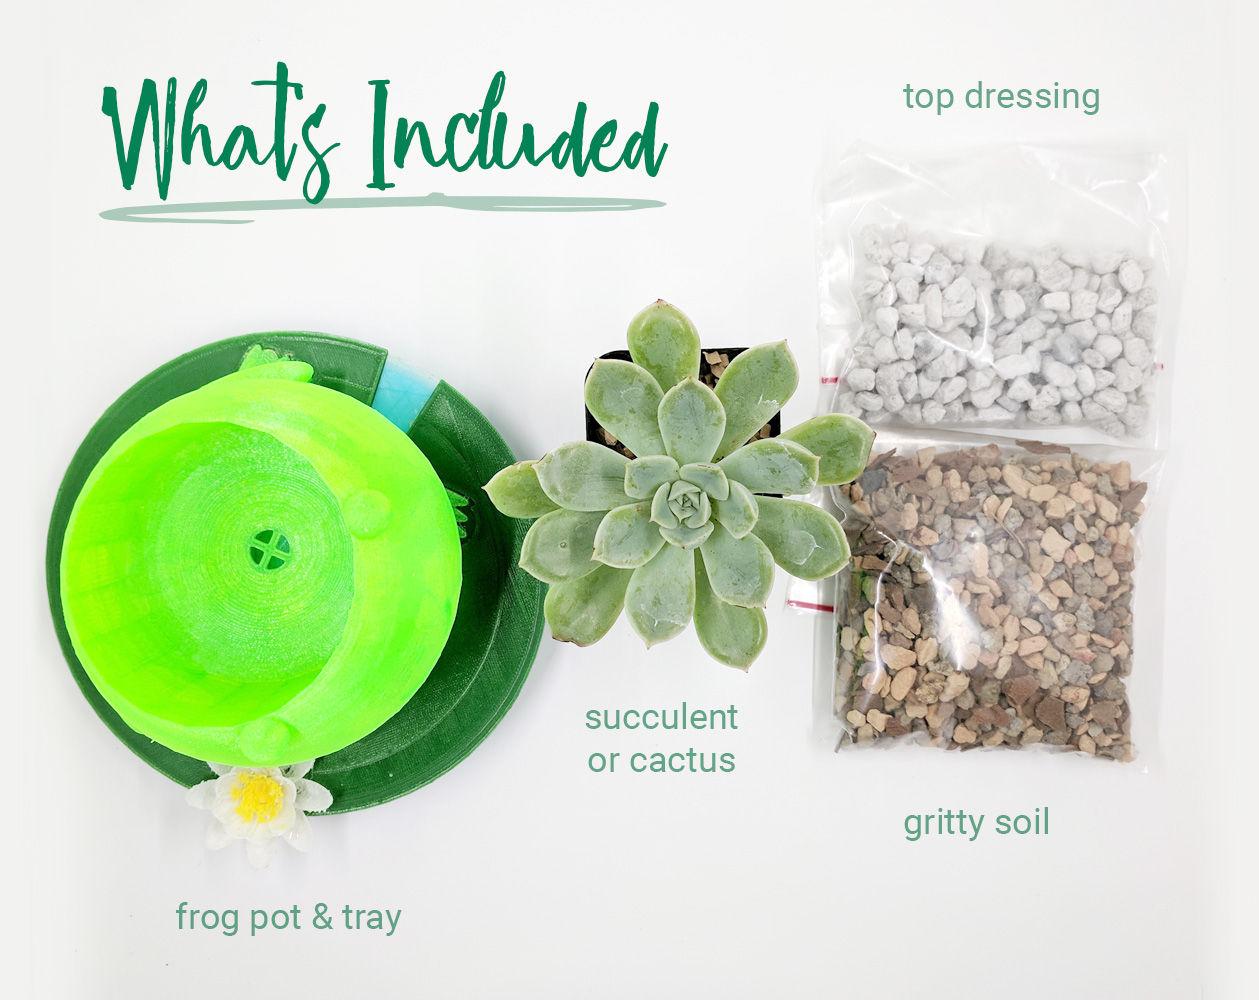 DIY Planter Kit includes soil, top dressing, plant and pot